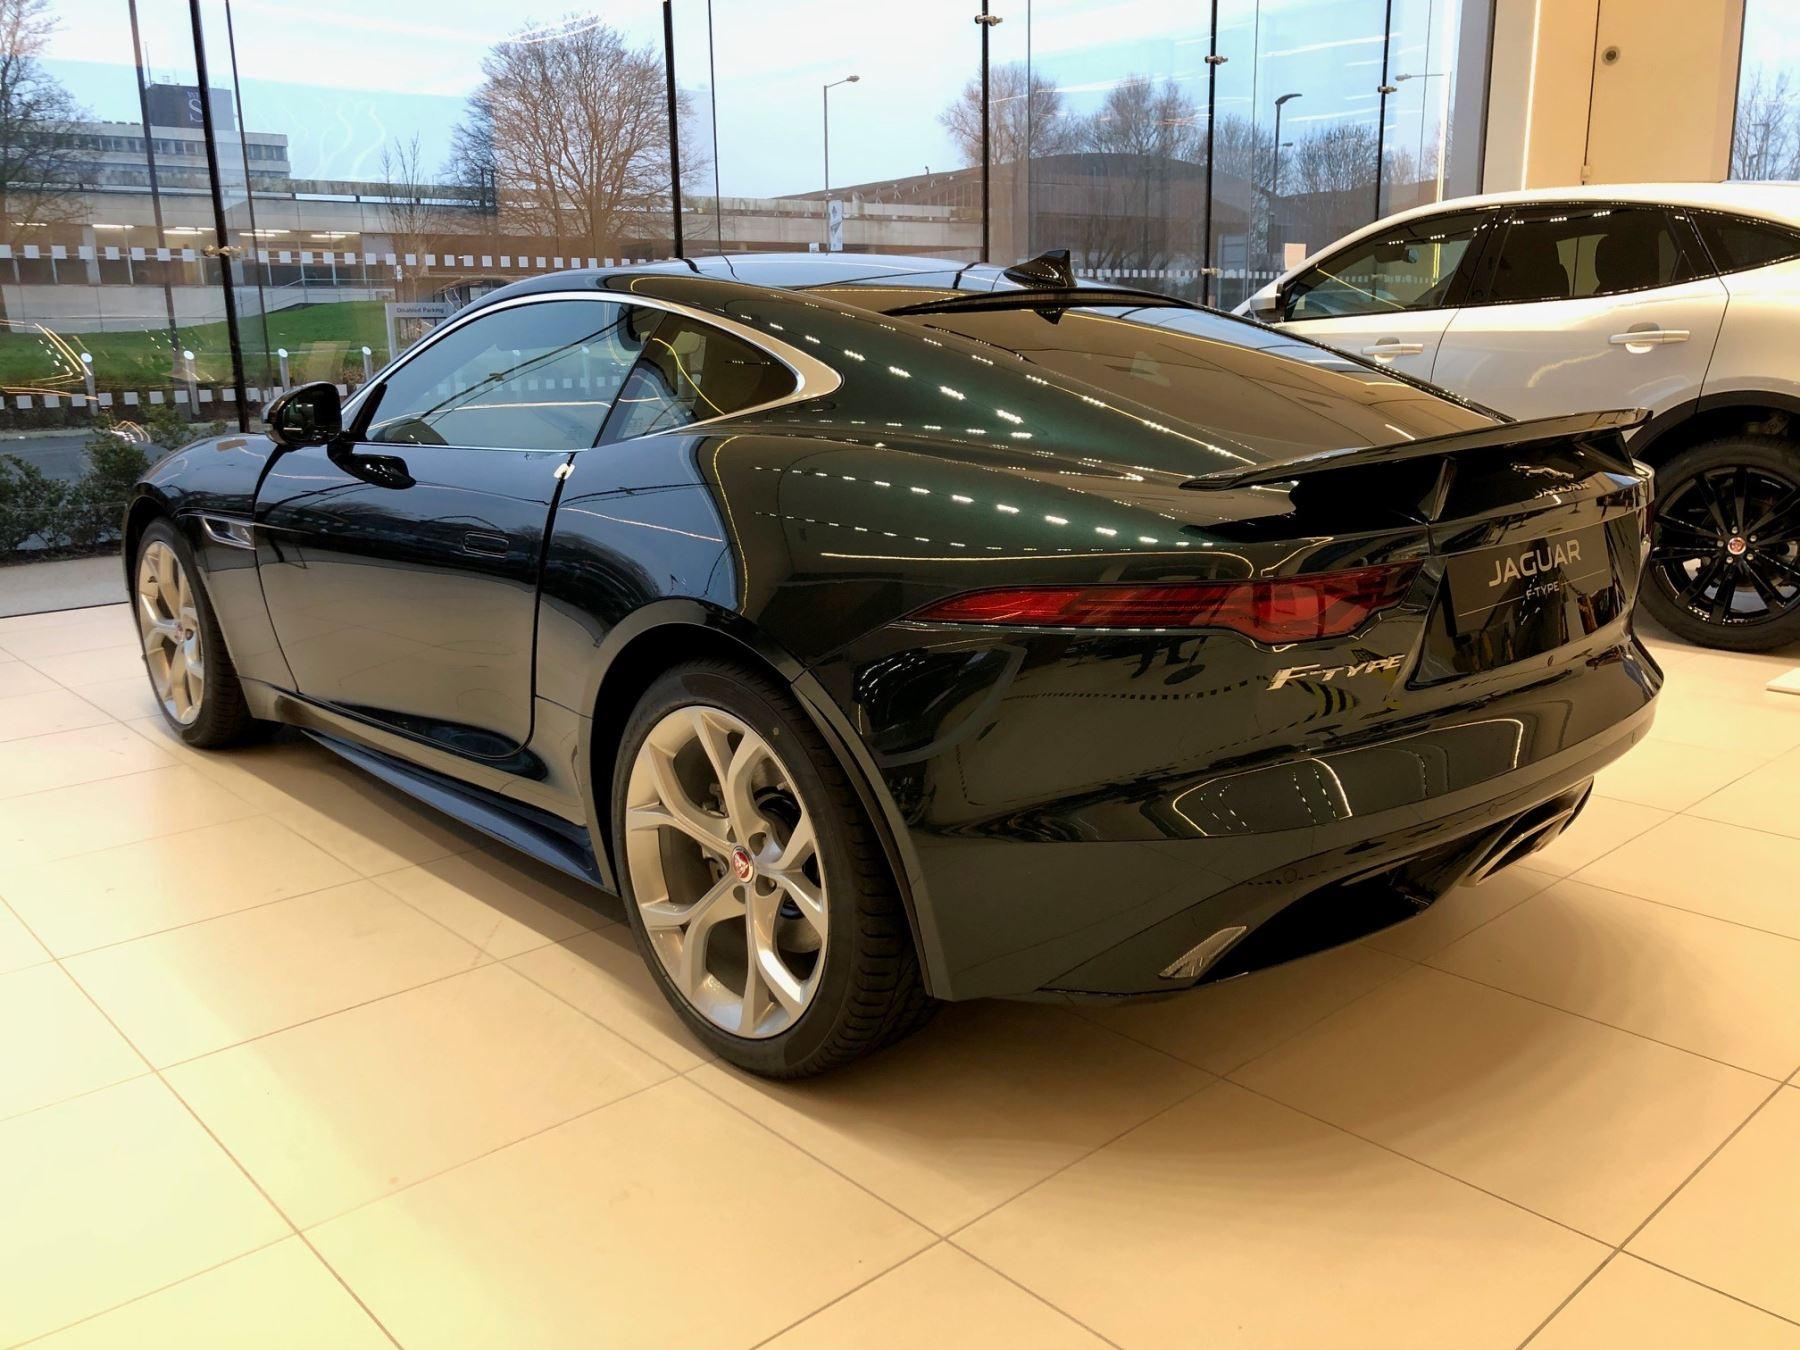 Jaguar F-TYPE Coupe Coupe 2.0 P300 RWD R-Dynamic image 3